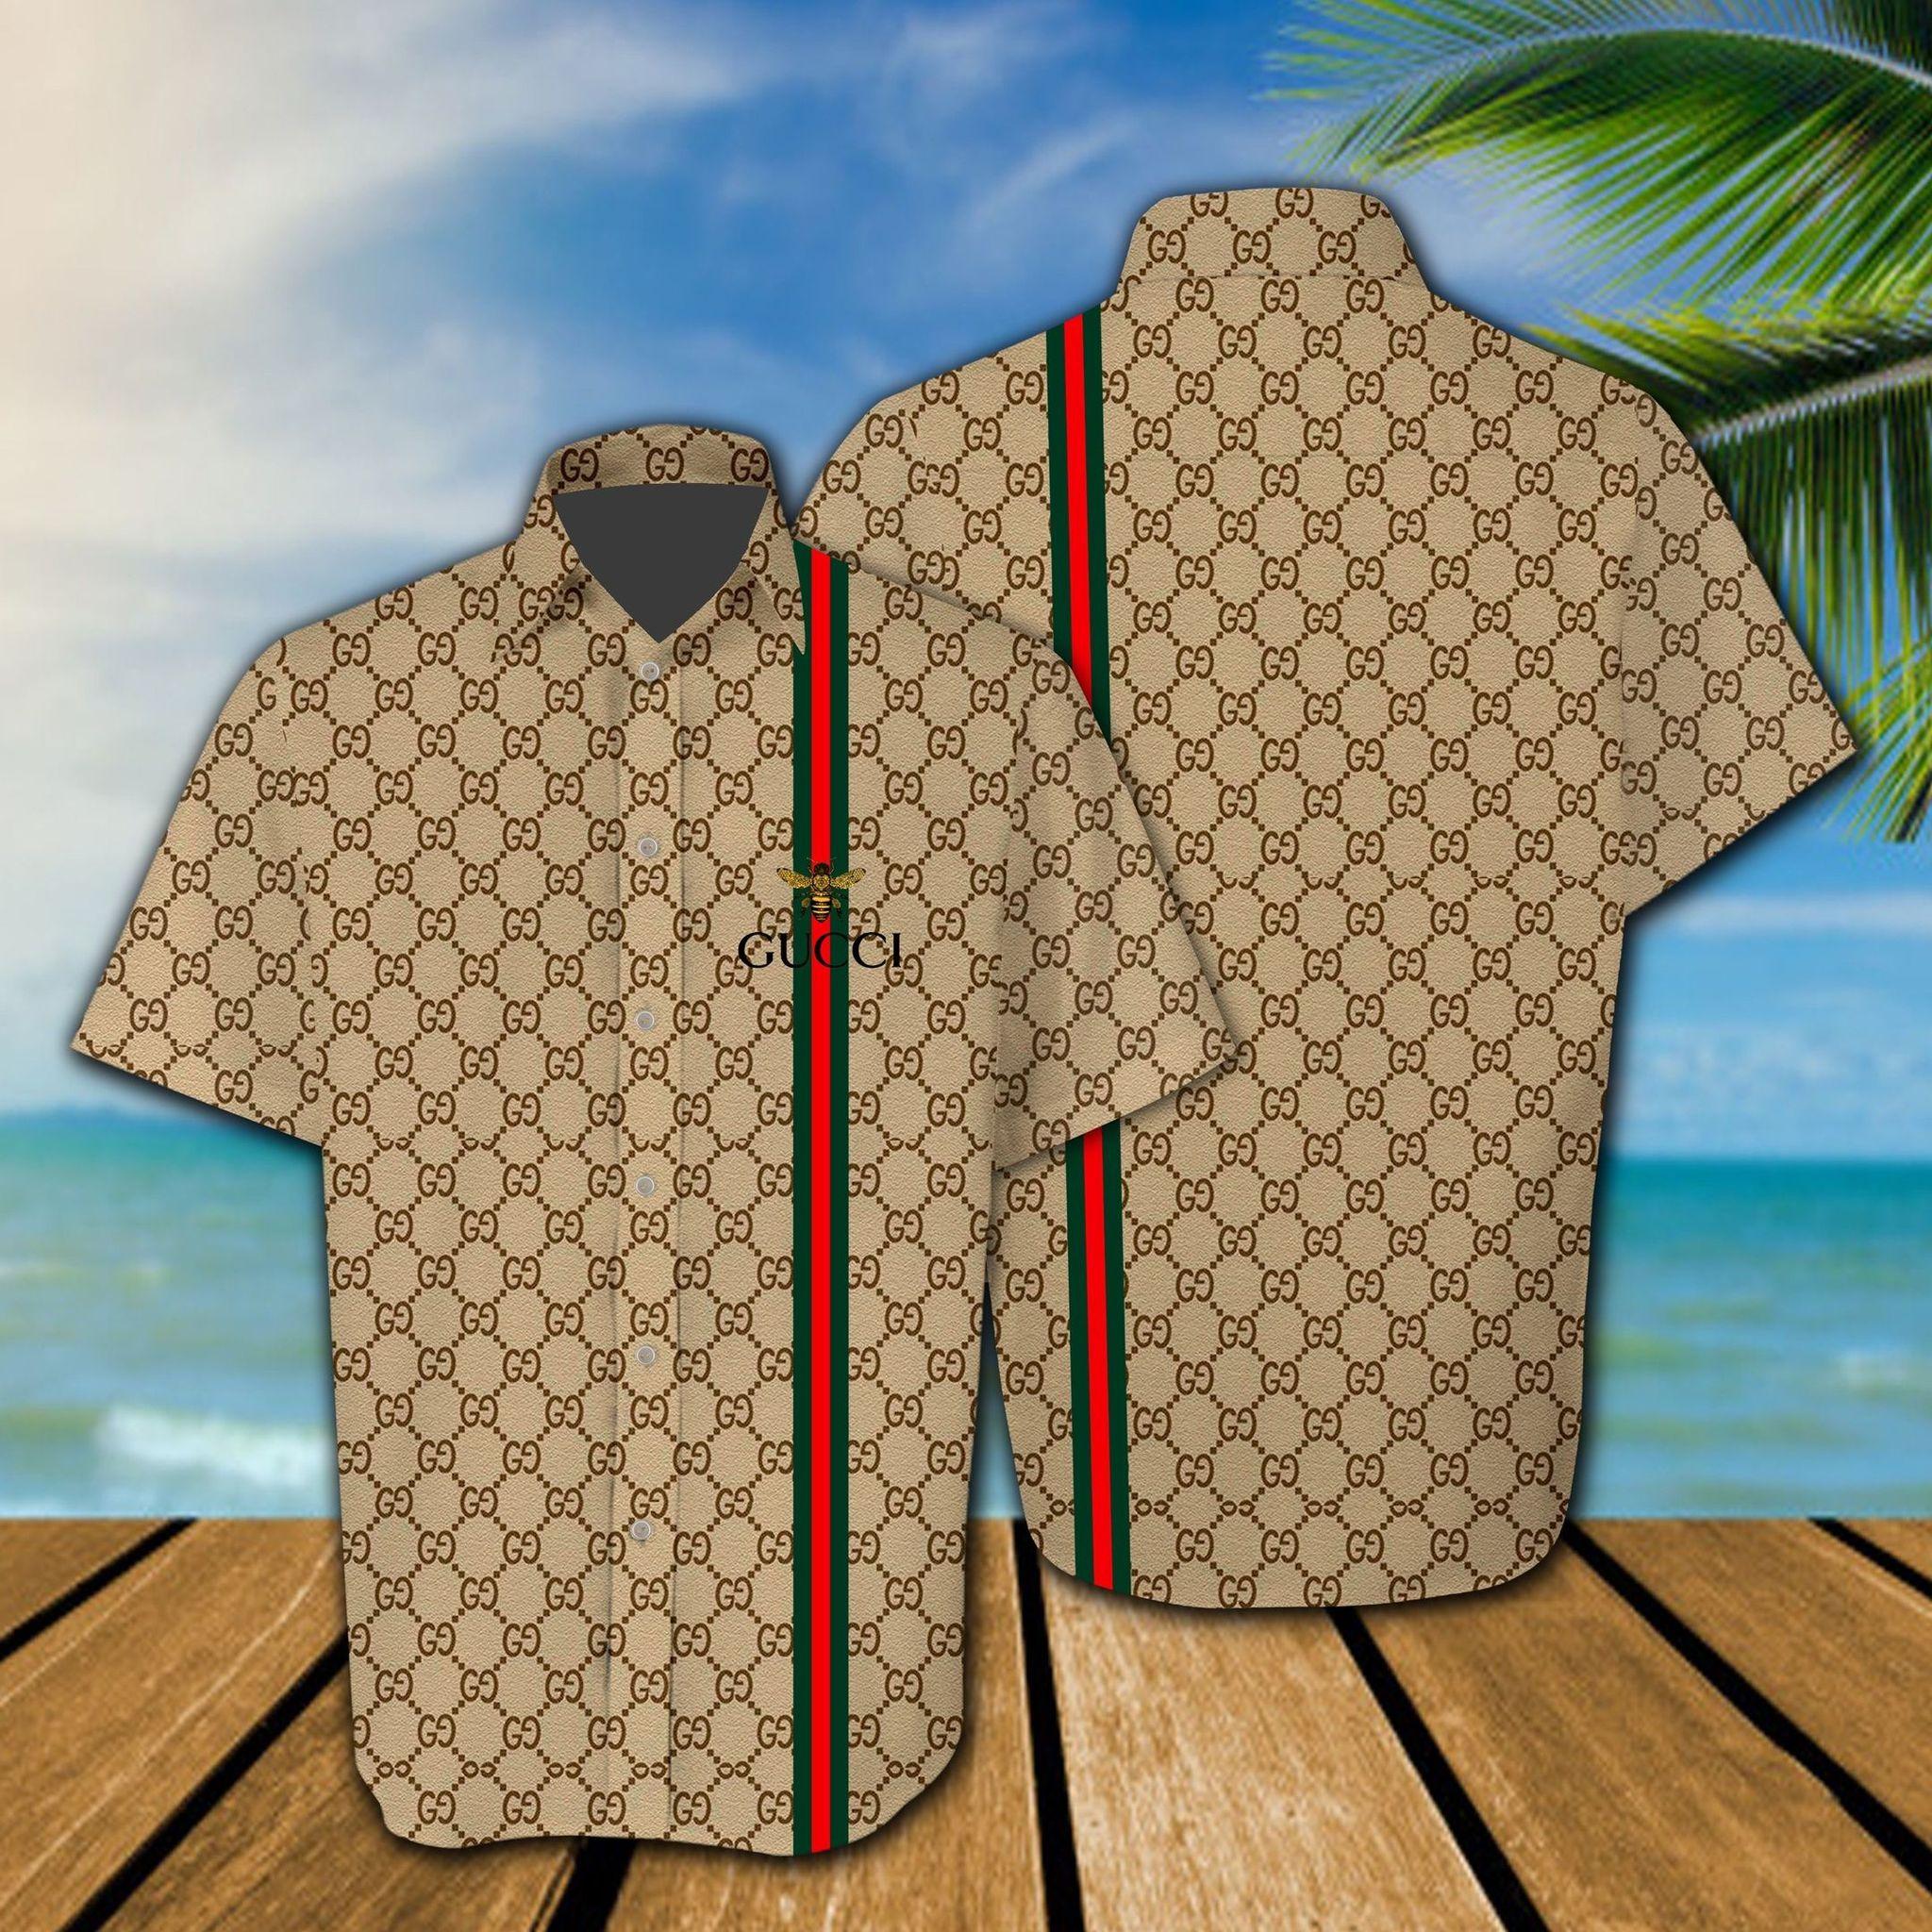 Gucci 3d all over printed Hawaiian shirt - LIMITED EDITION